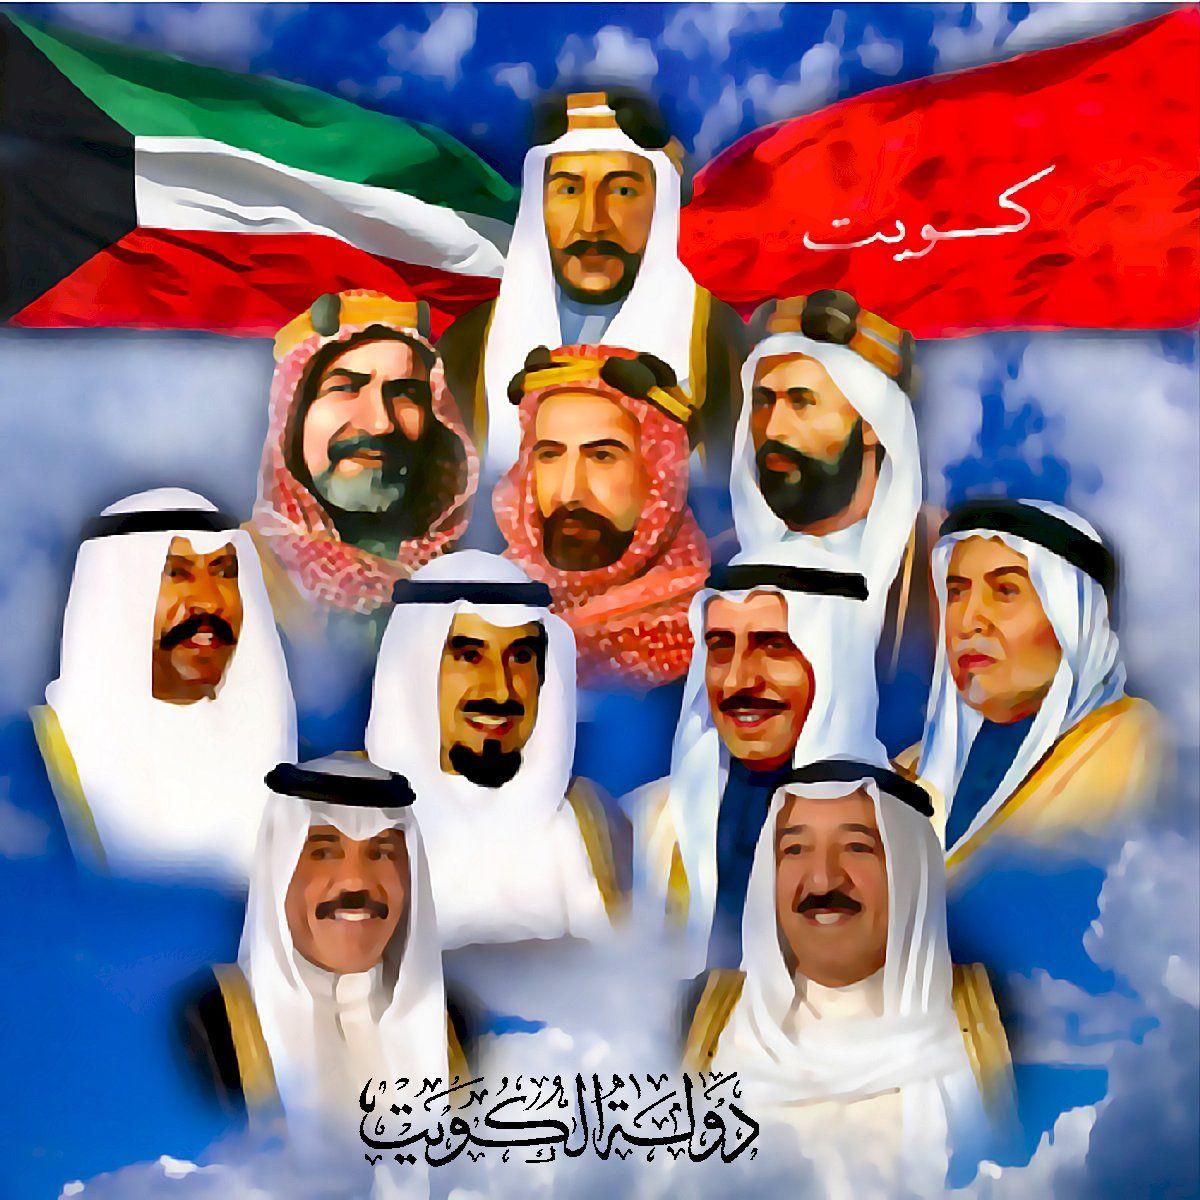 حكام الكويت Kuwait Rulers Kuwait Baby Boy Fashion Photo